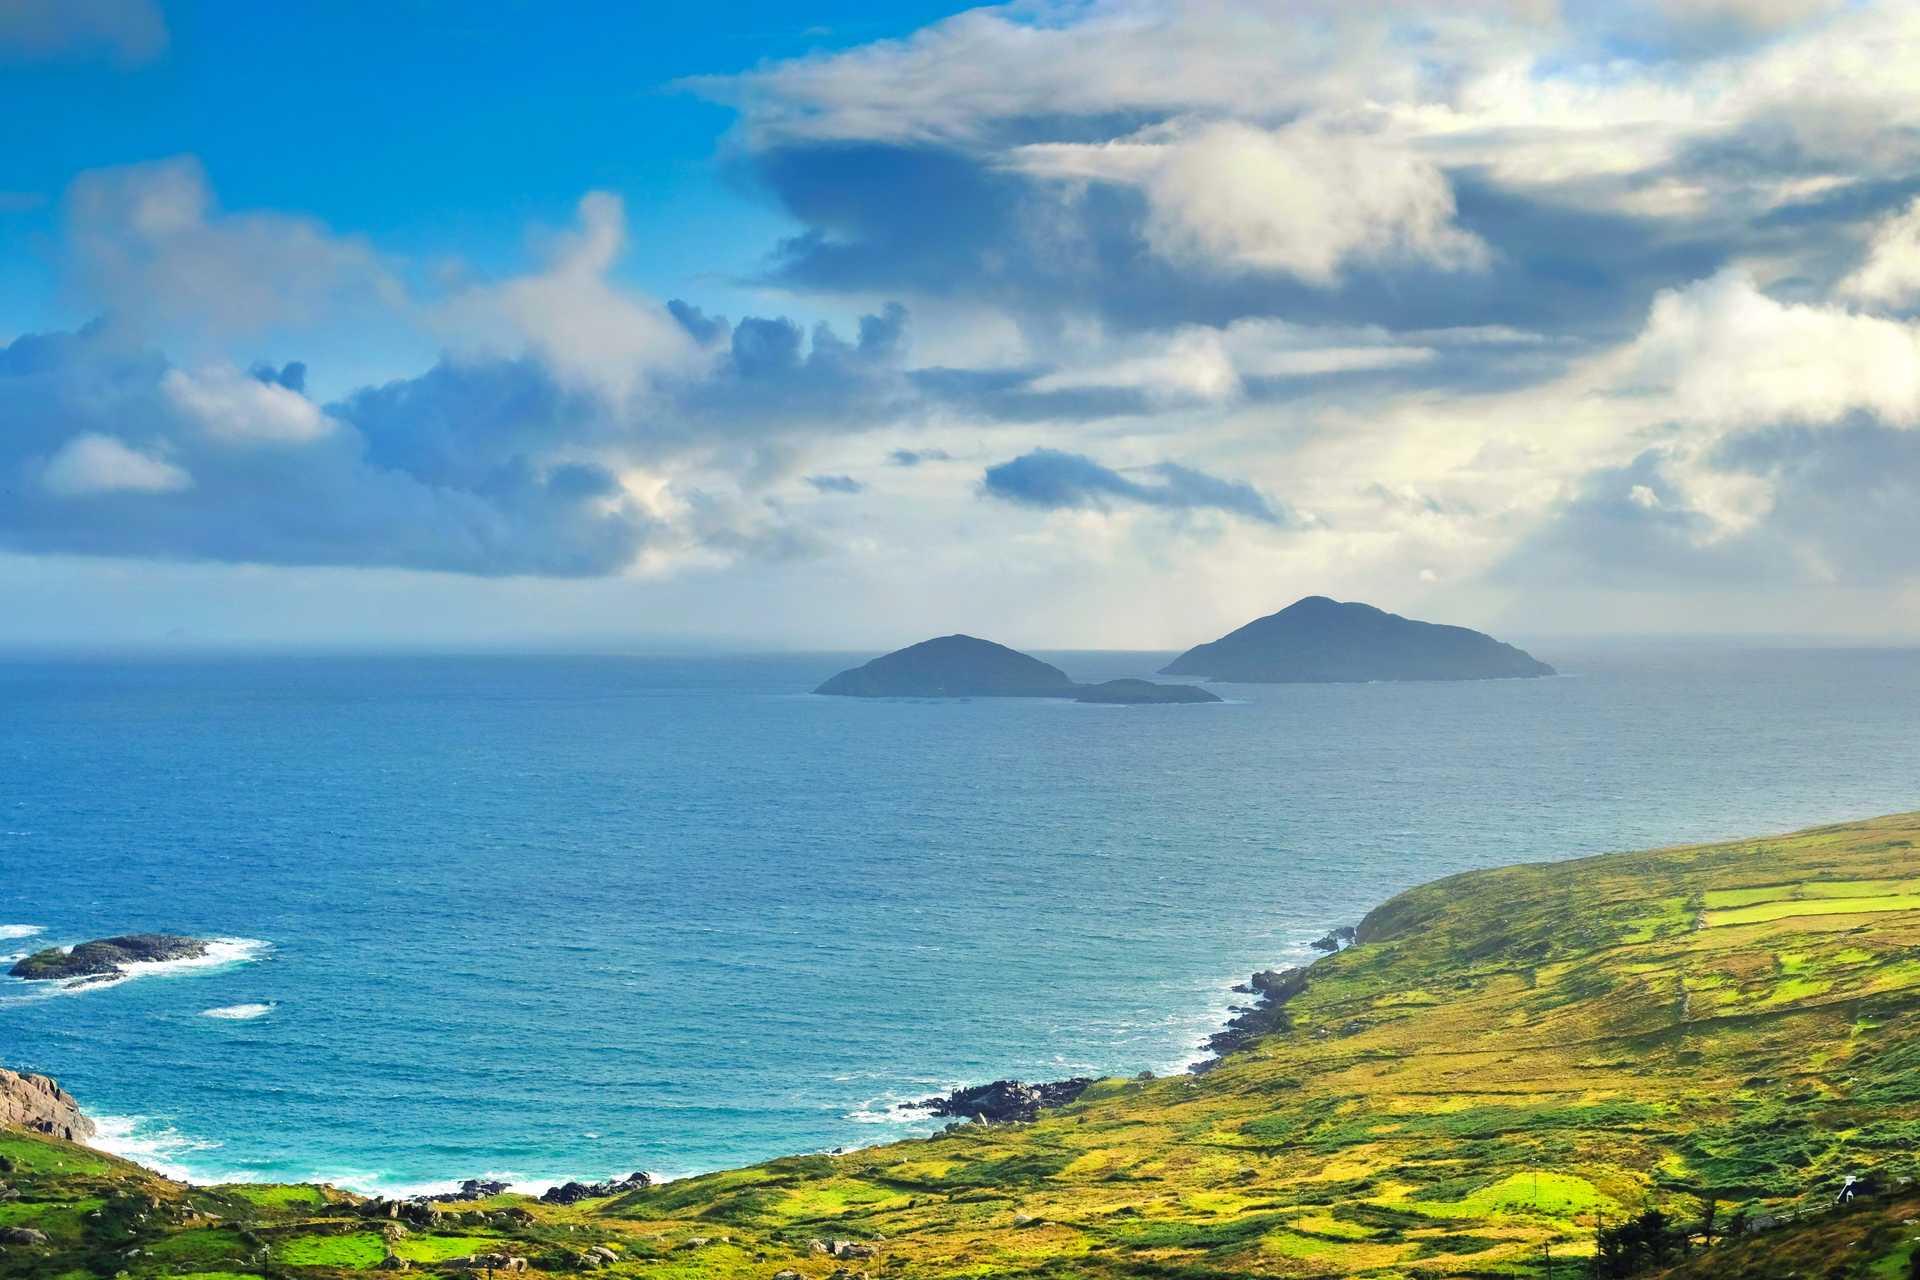 Iles du kerry, Irlande